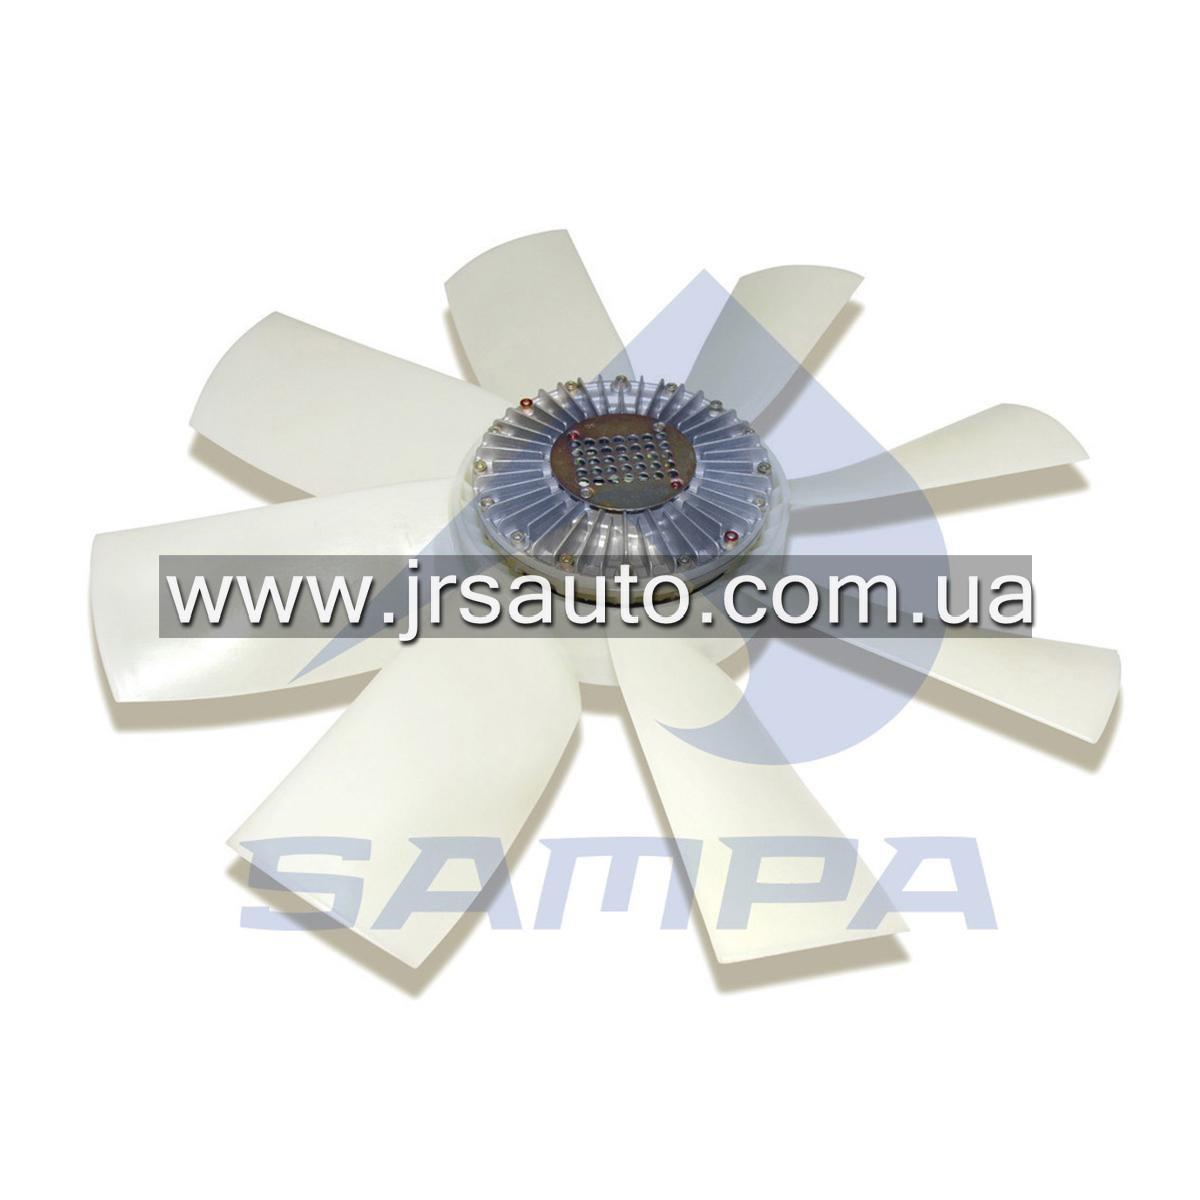 Вентилятор с вискомуфтой VOLVO (d680 mm) \8112950 \ 032.100